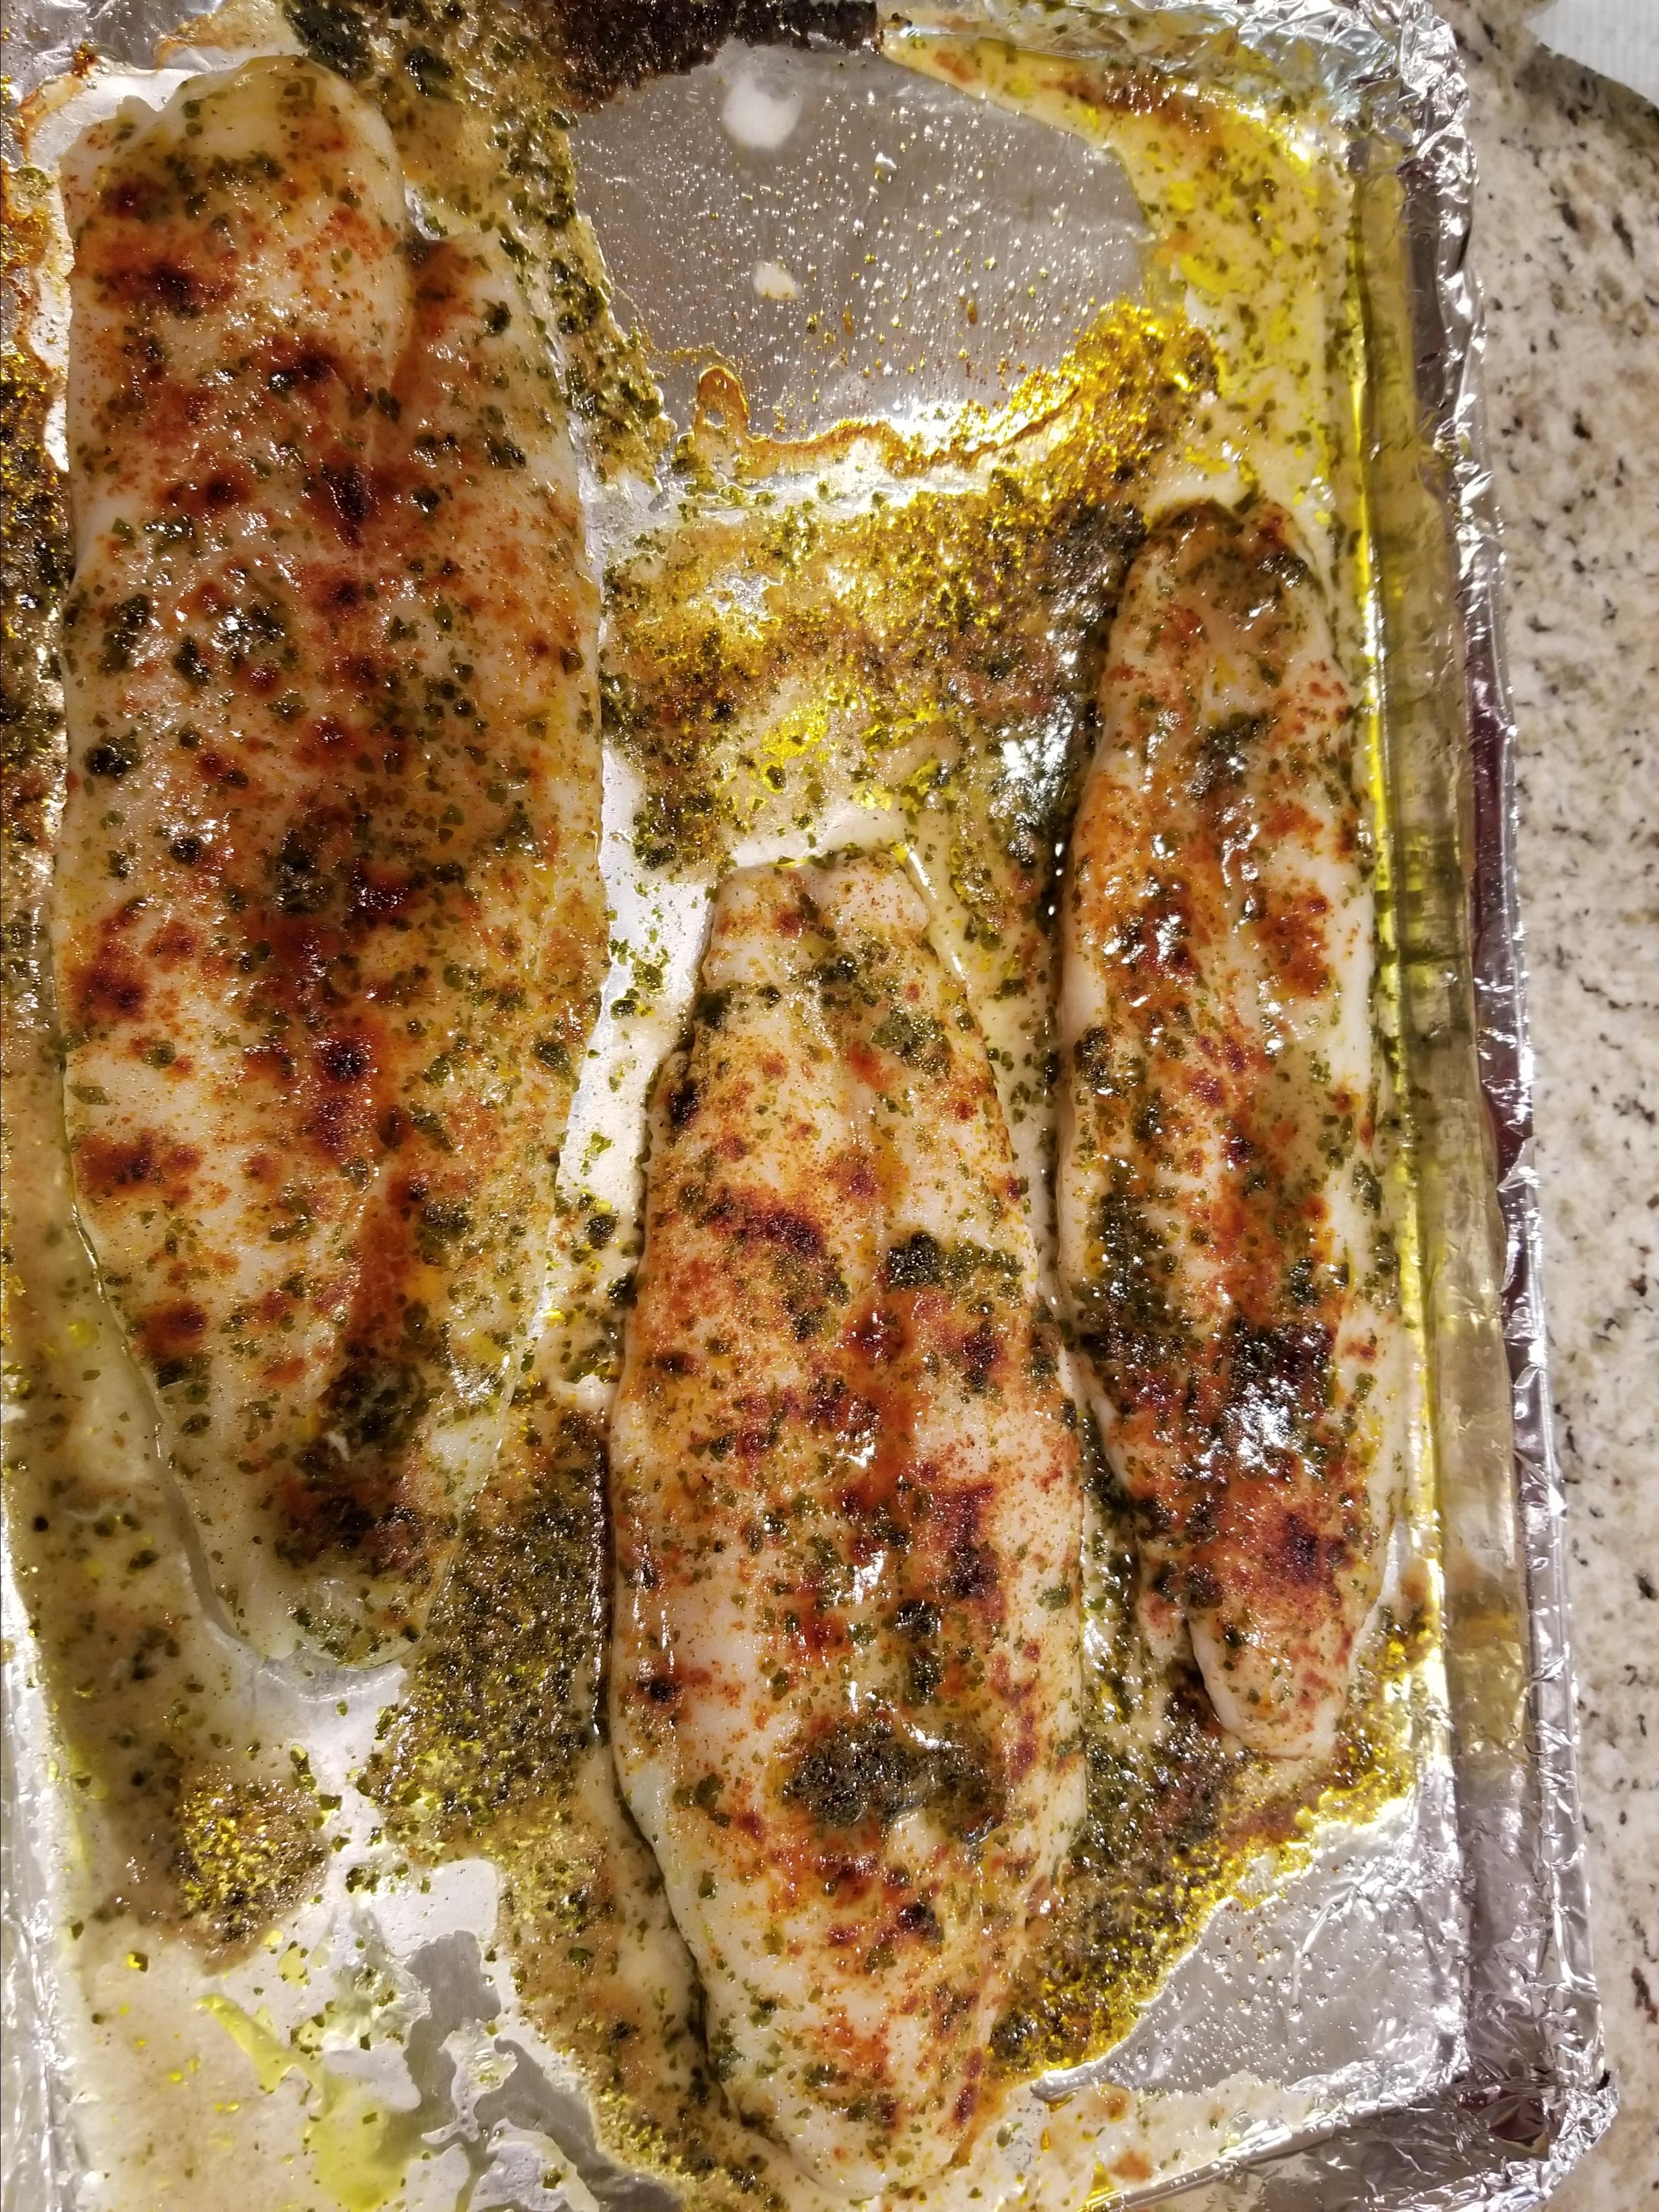 Seasoned Swai Fish Fillet Eyzofgrene